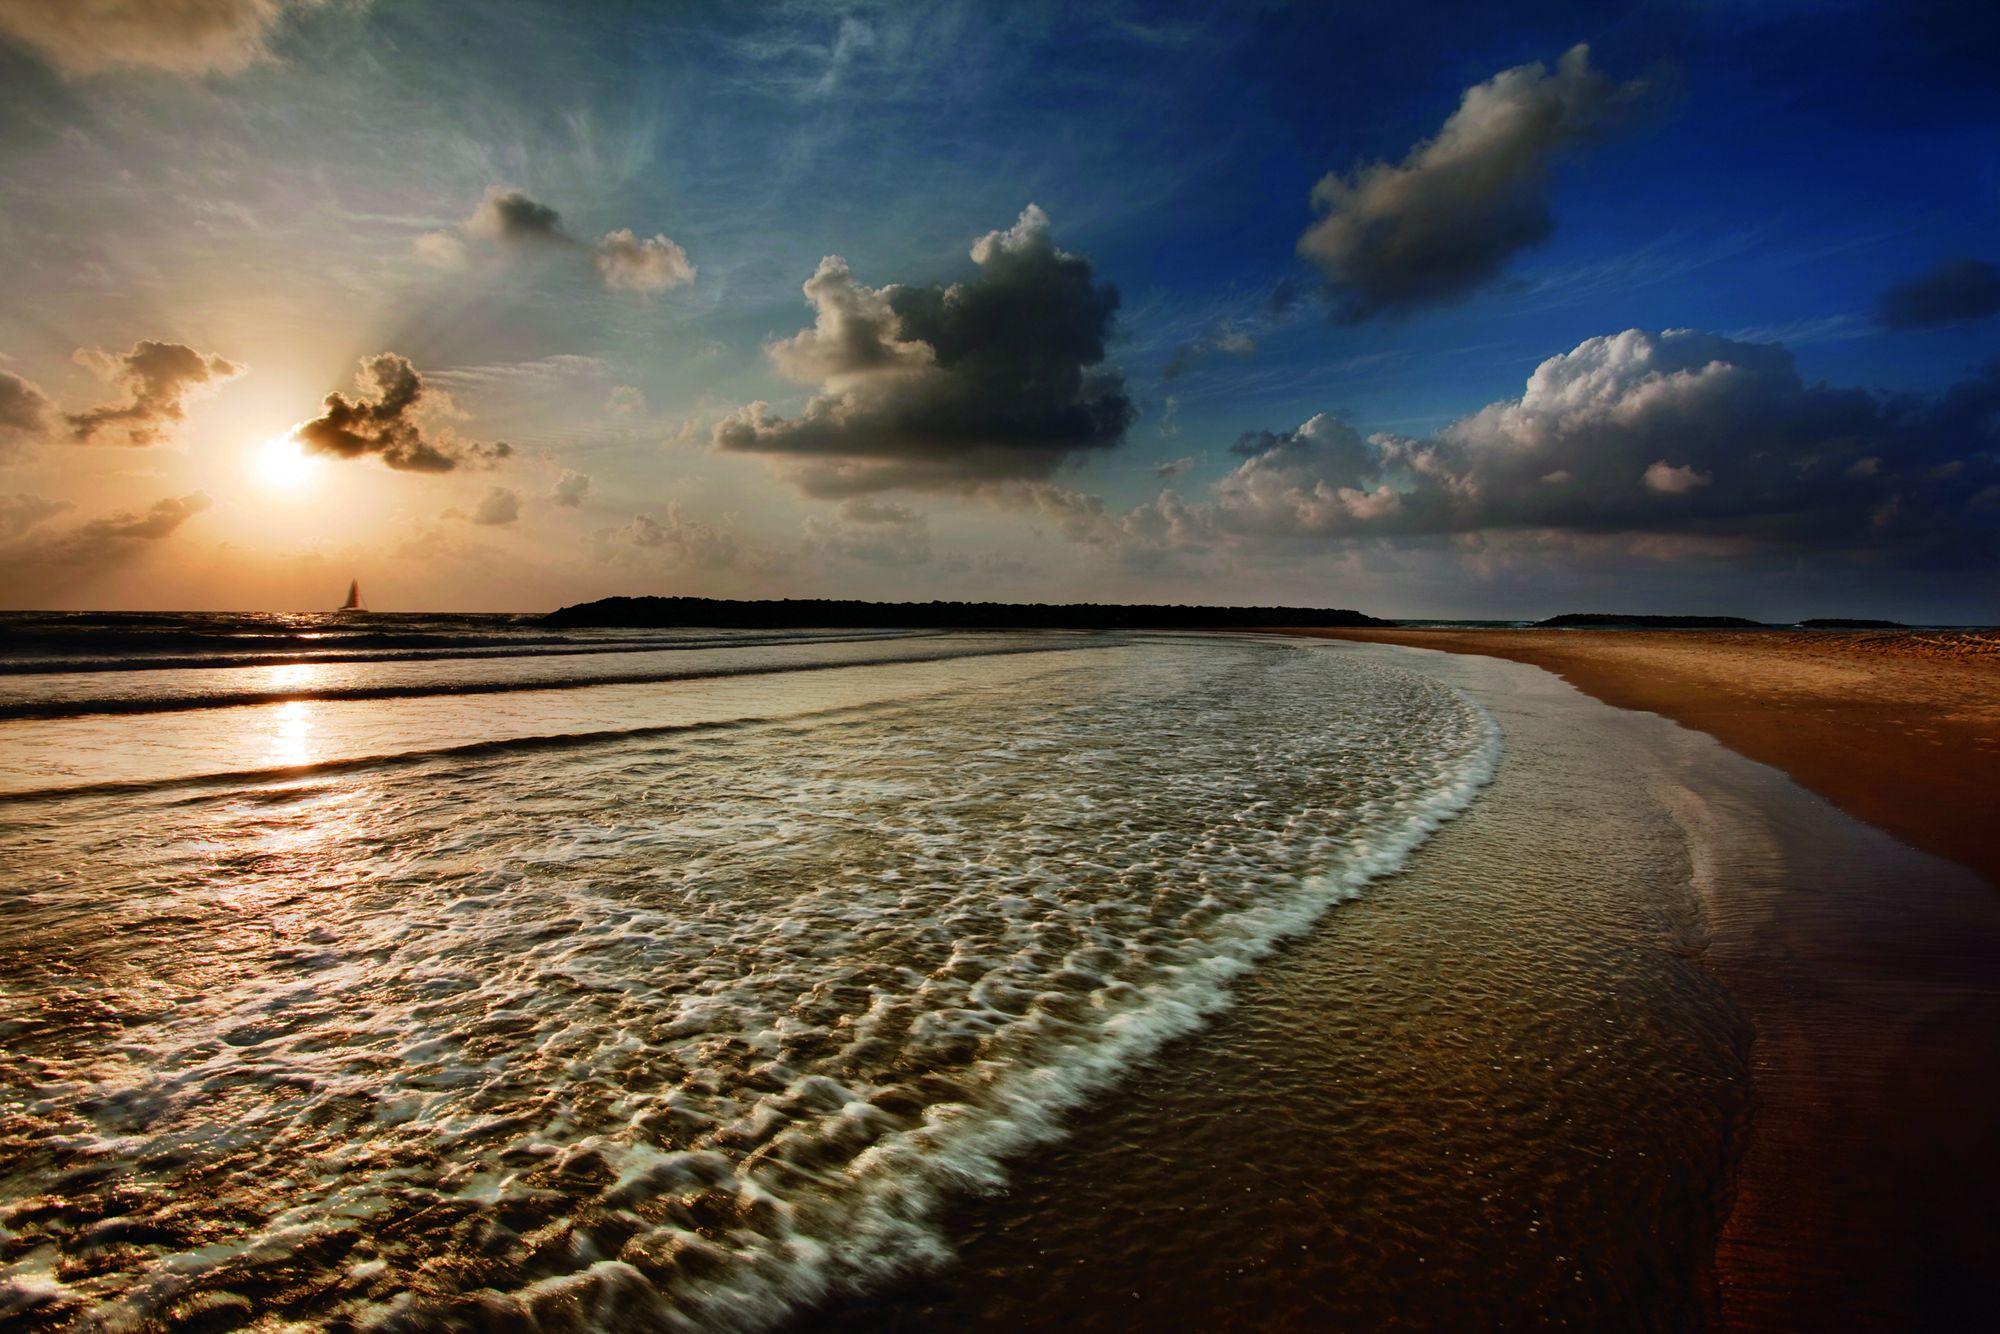 Beautiful sunset over the beach at the Tel Aviv coastal retreat of The Ritz-Carlton, Herzliya